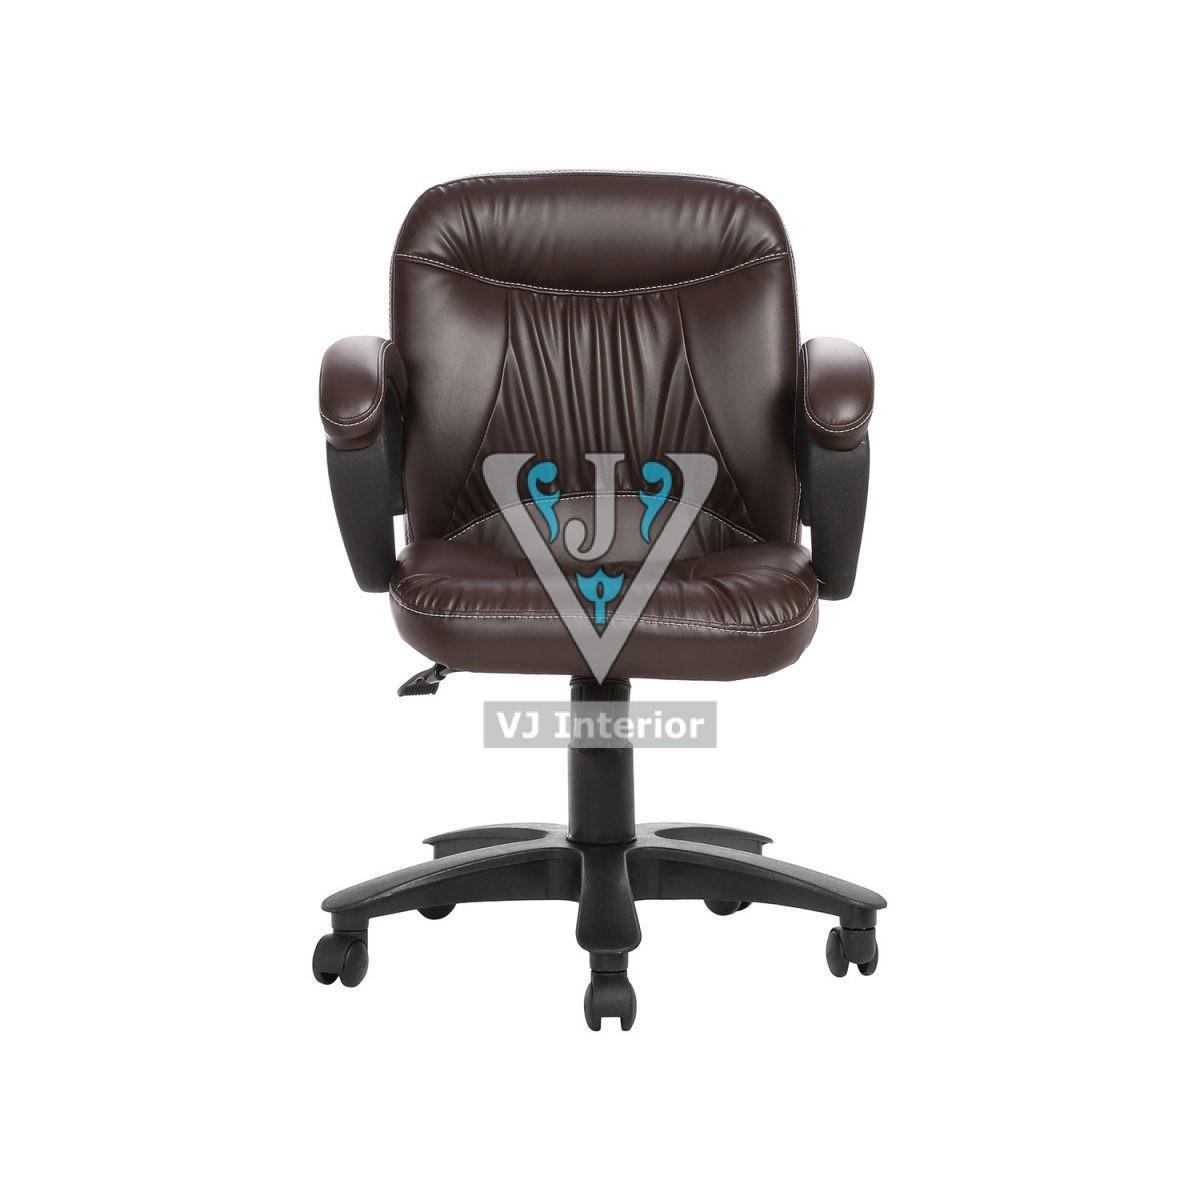 The Delantal Workstaion Chair Brown